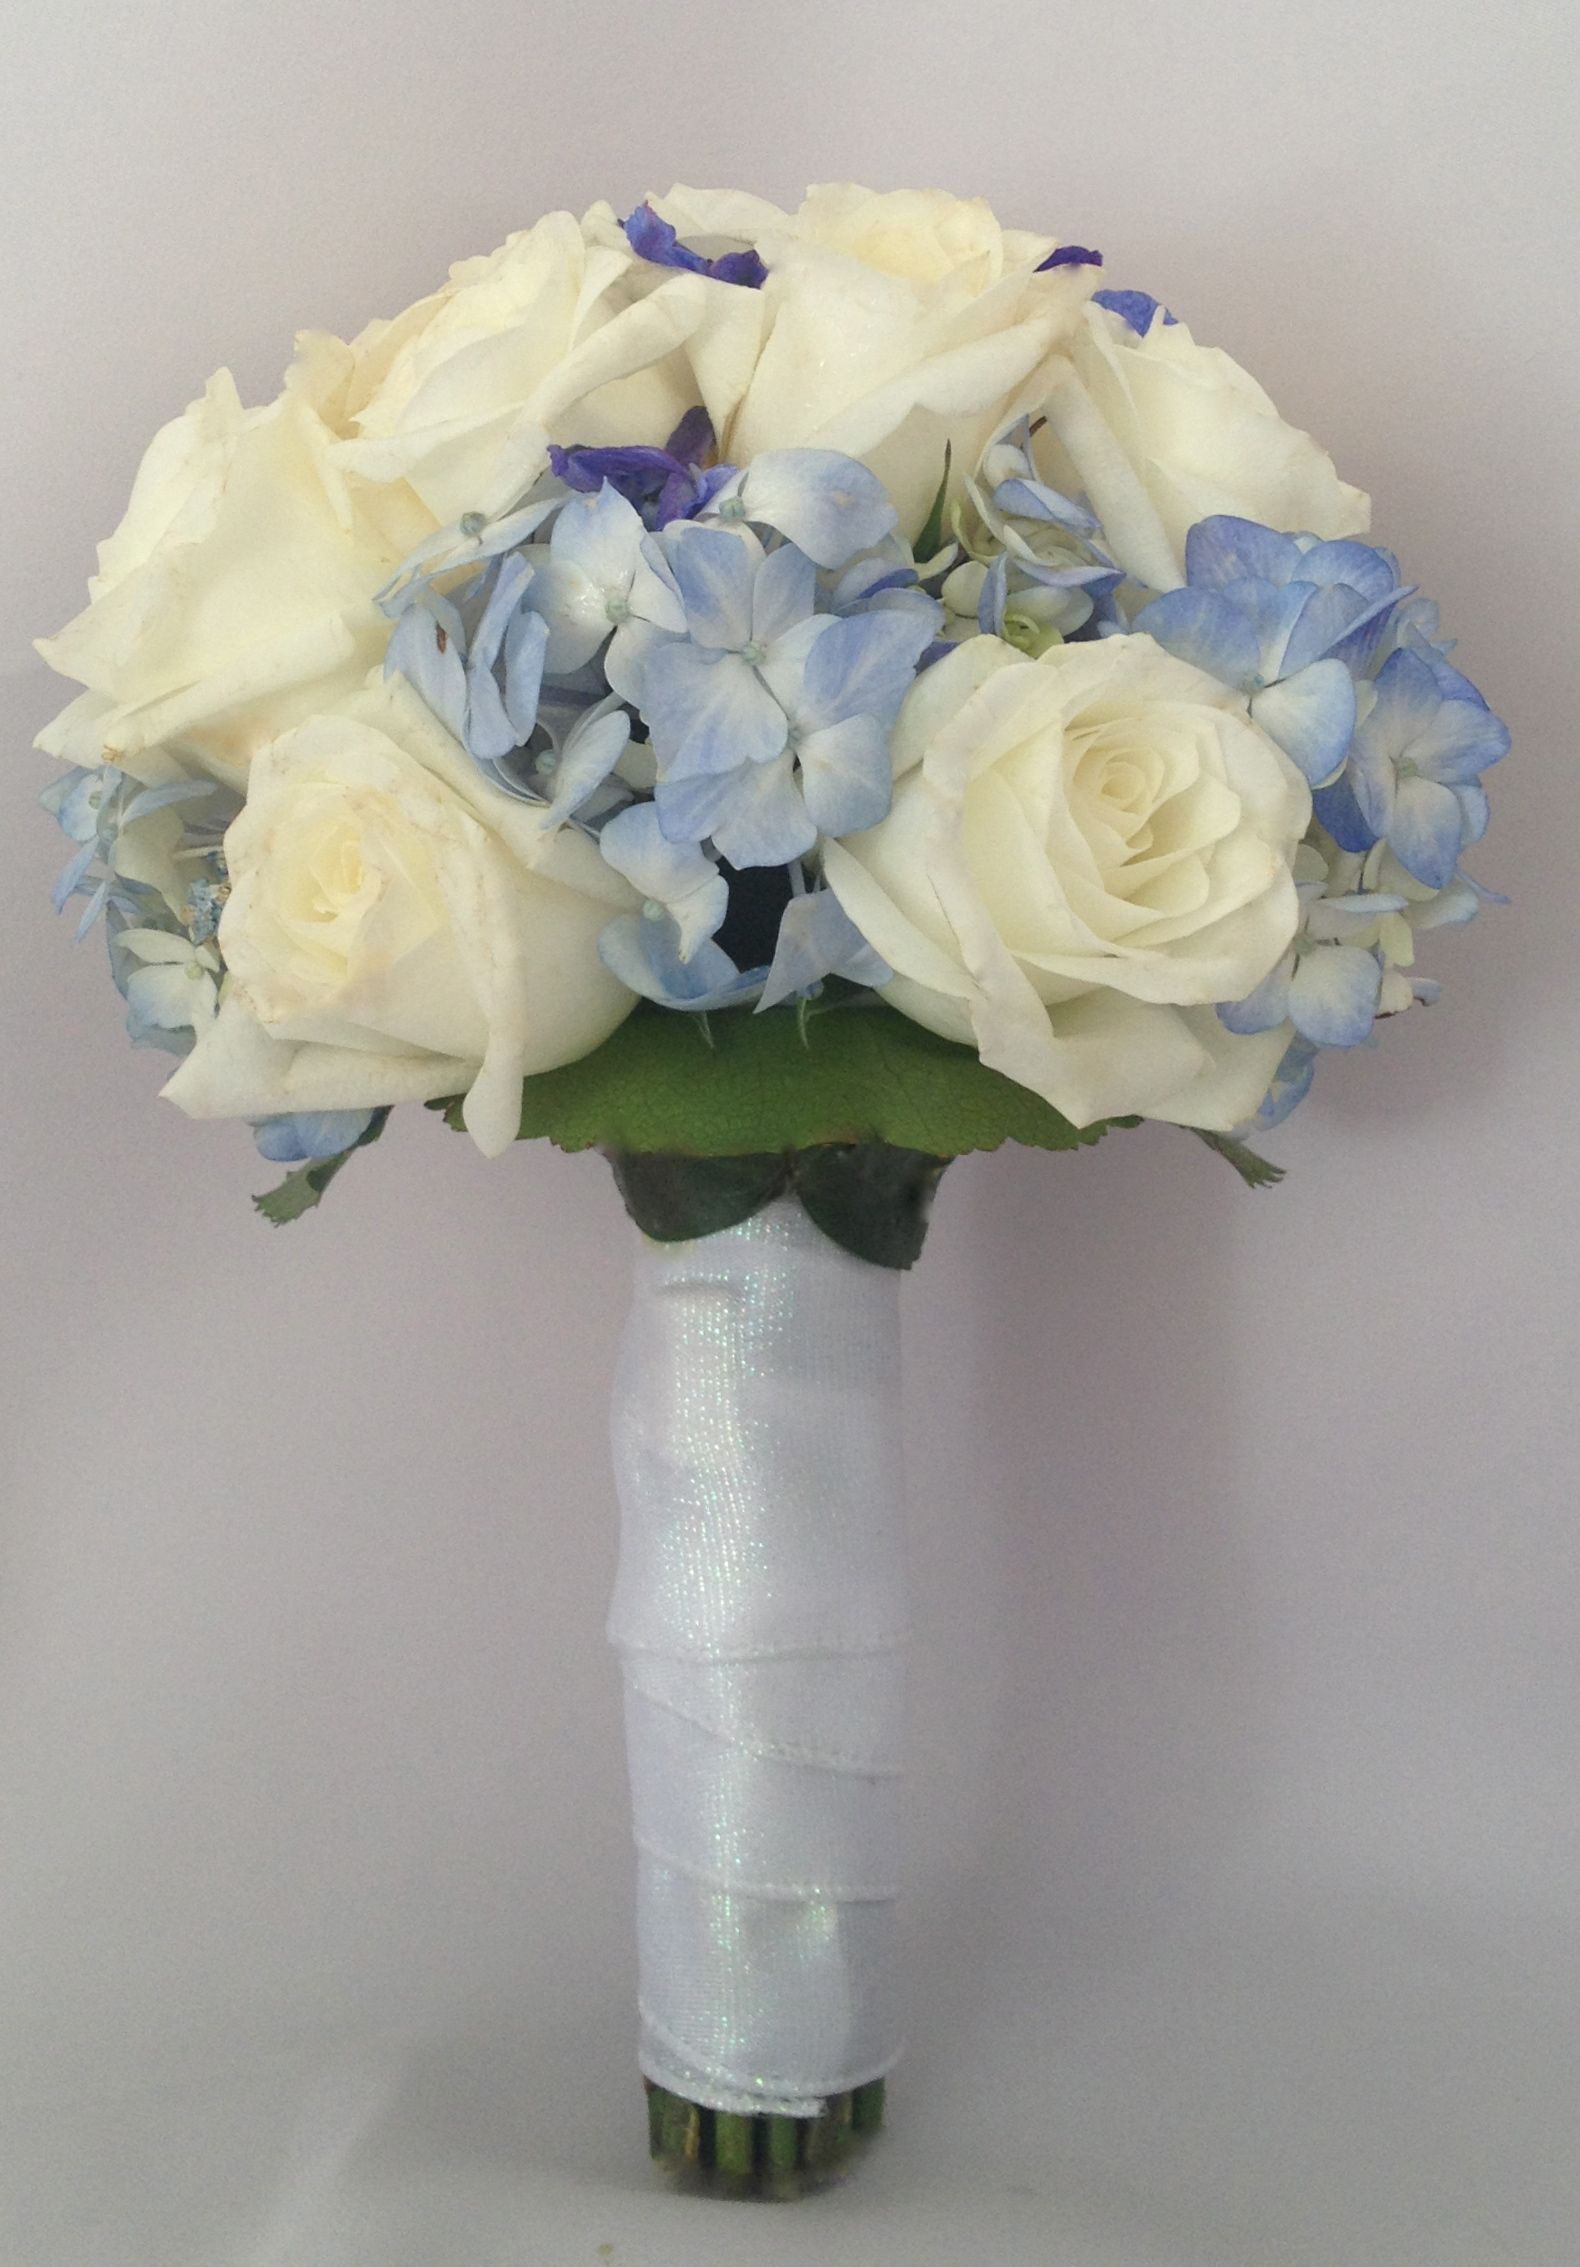 white and blue bridal wedding bouquet wedding roses